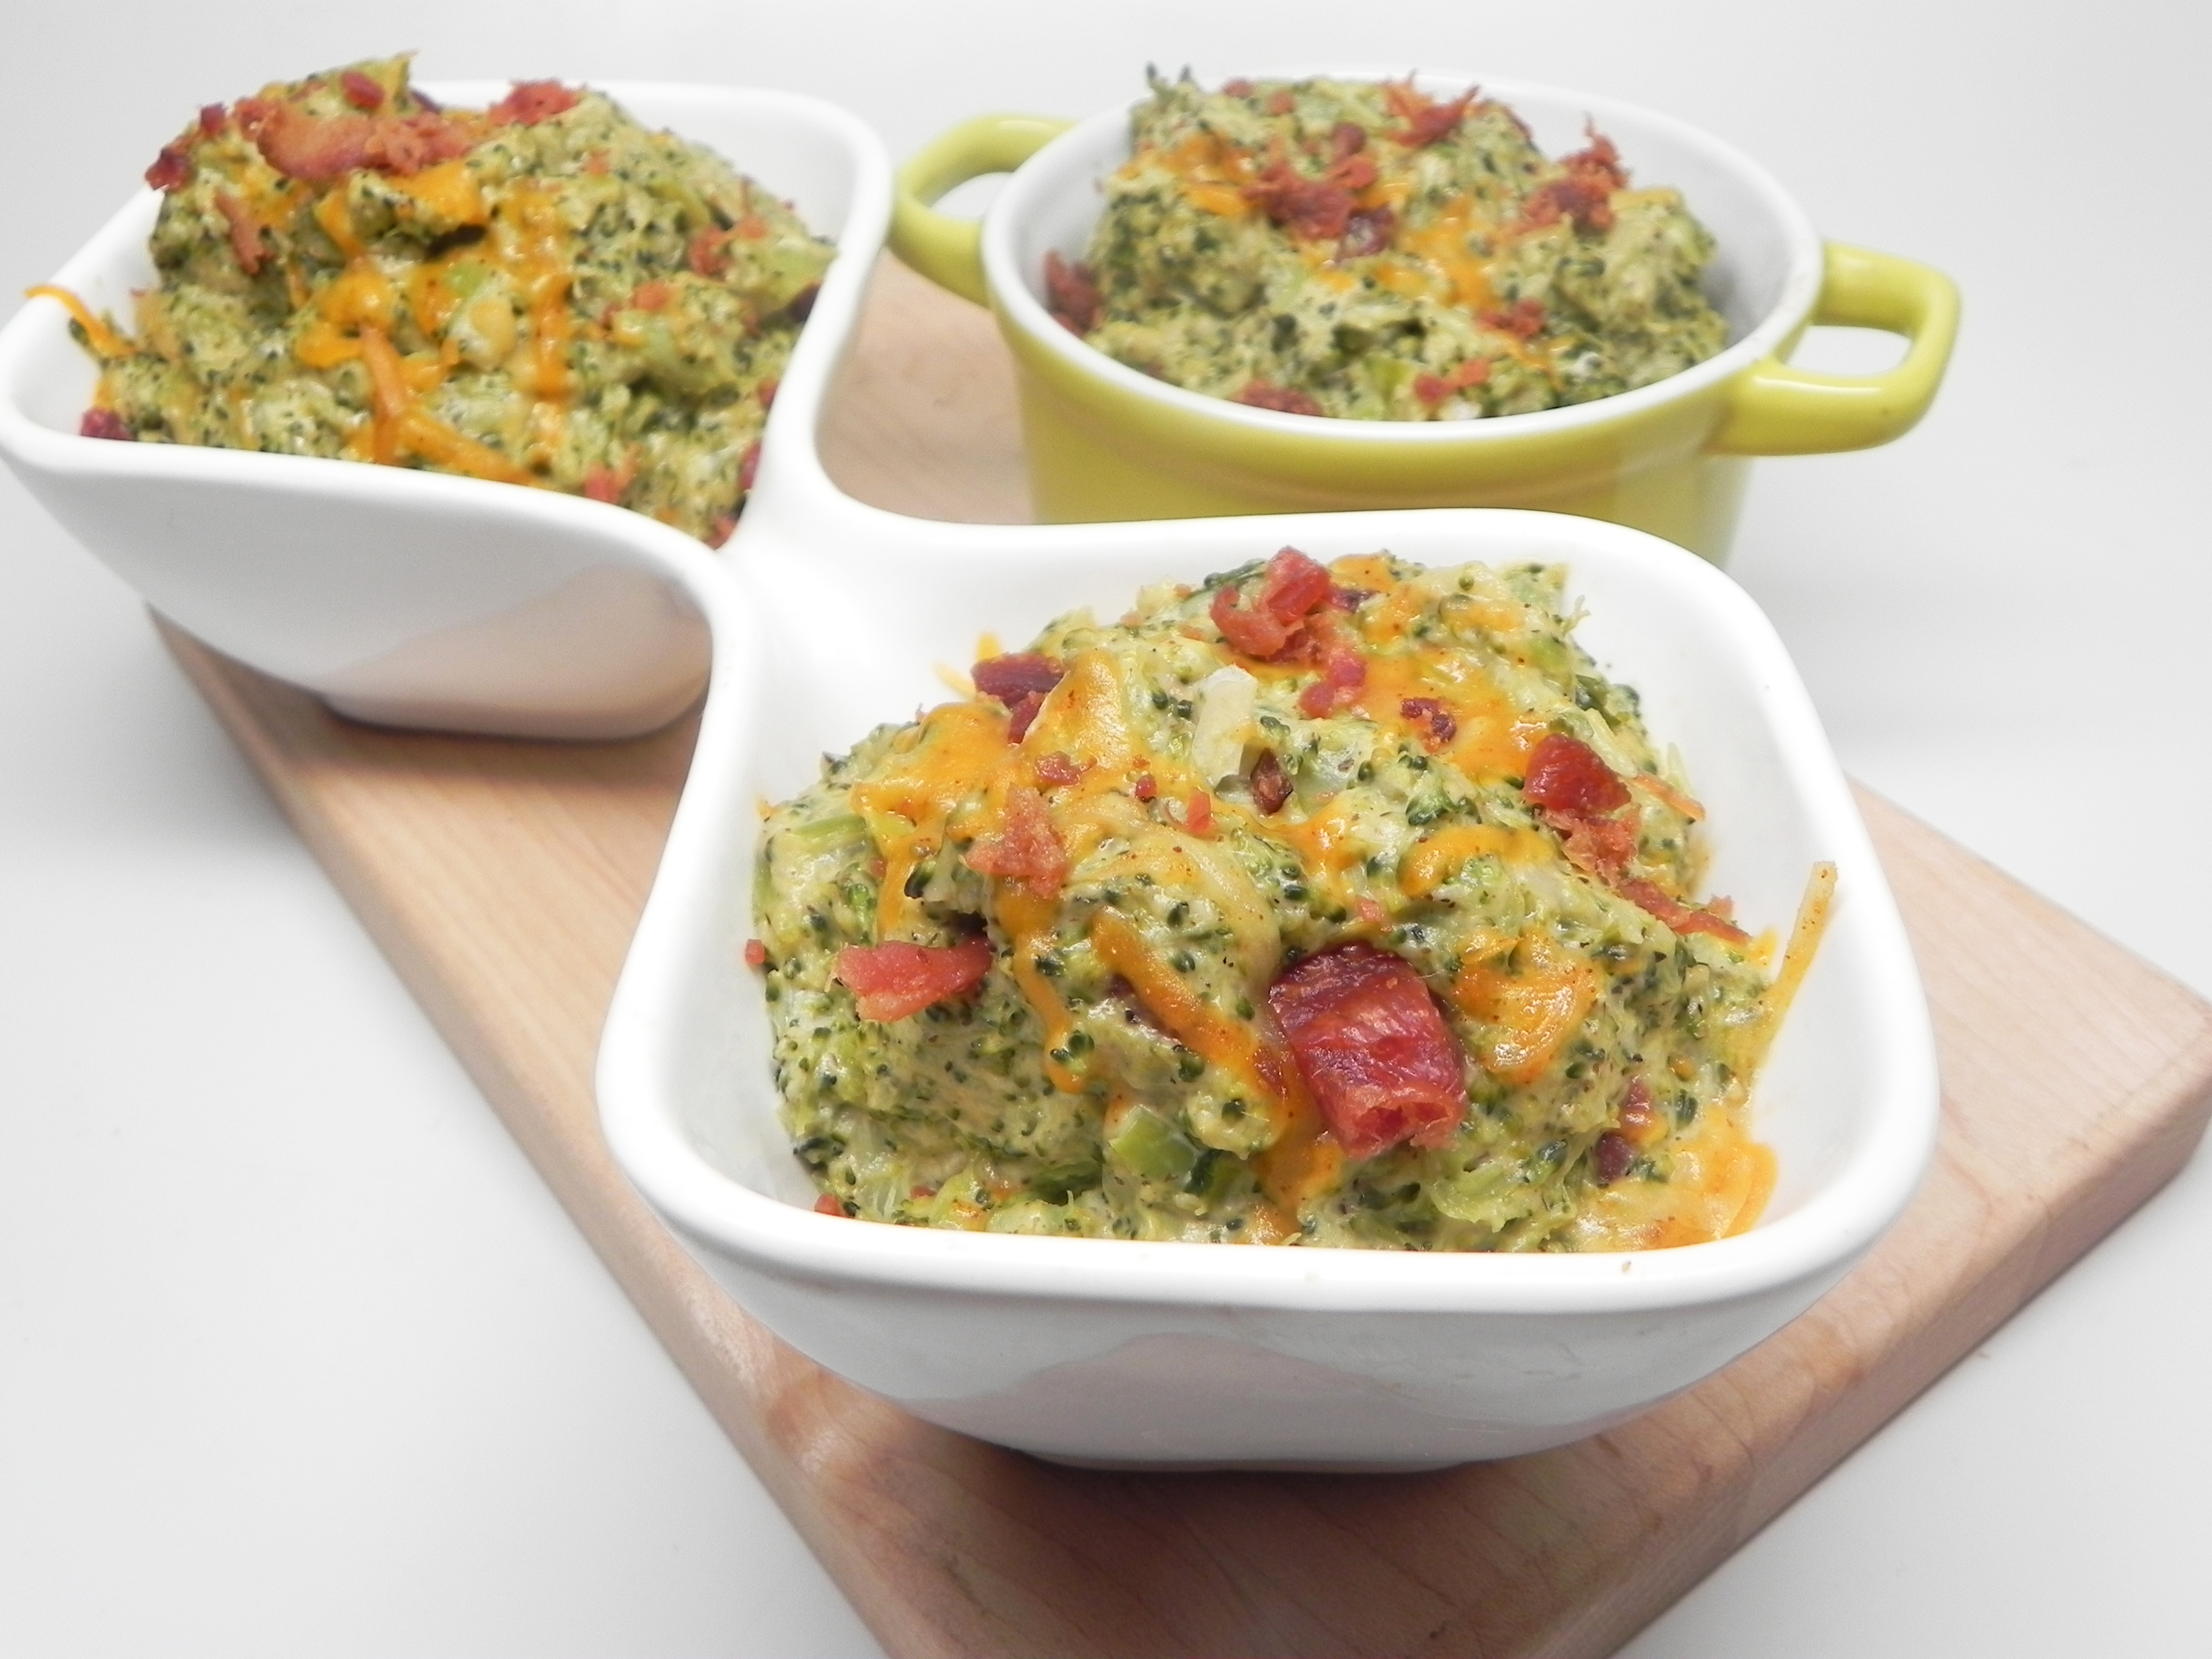 Instant Pot(R) Loaded Broccoli Mash